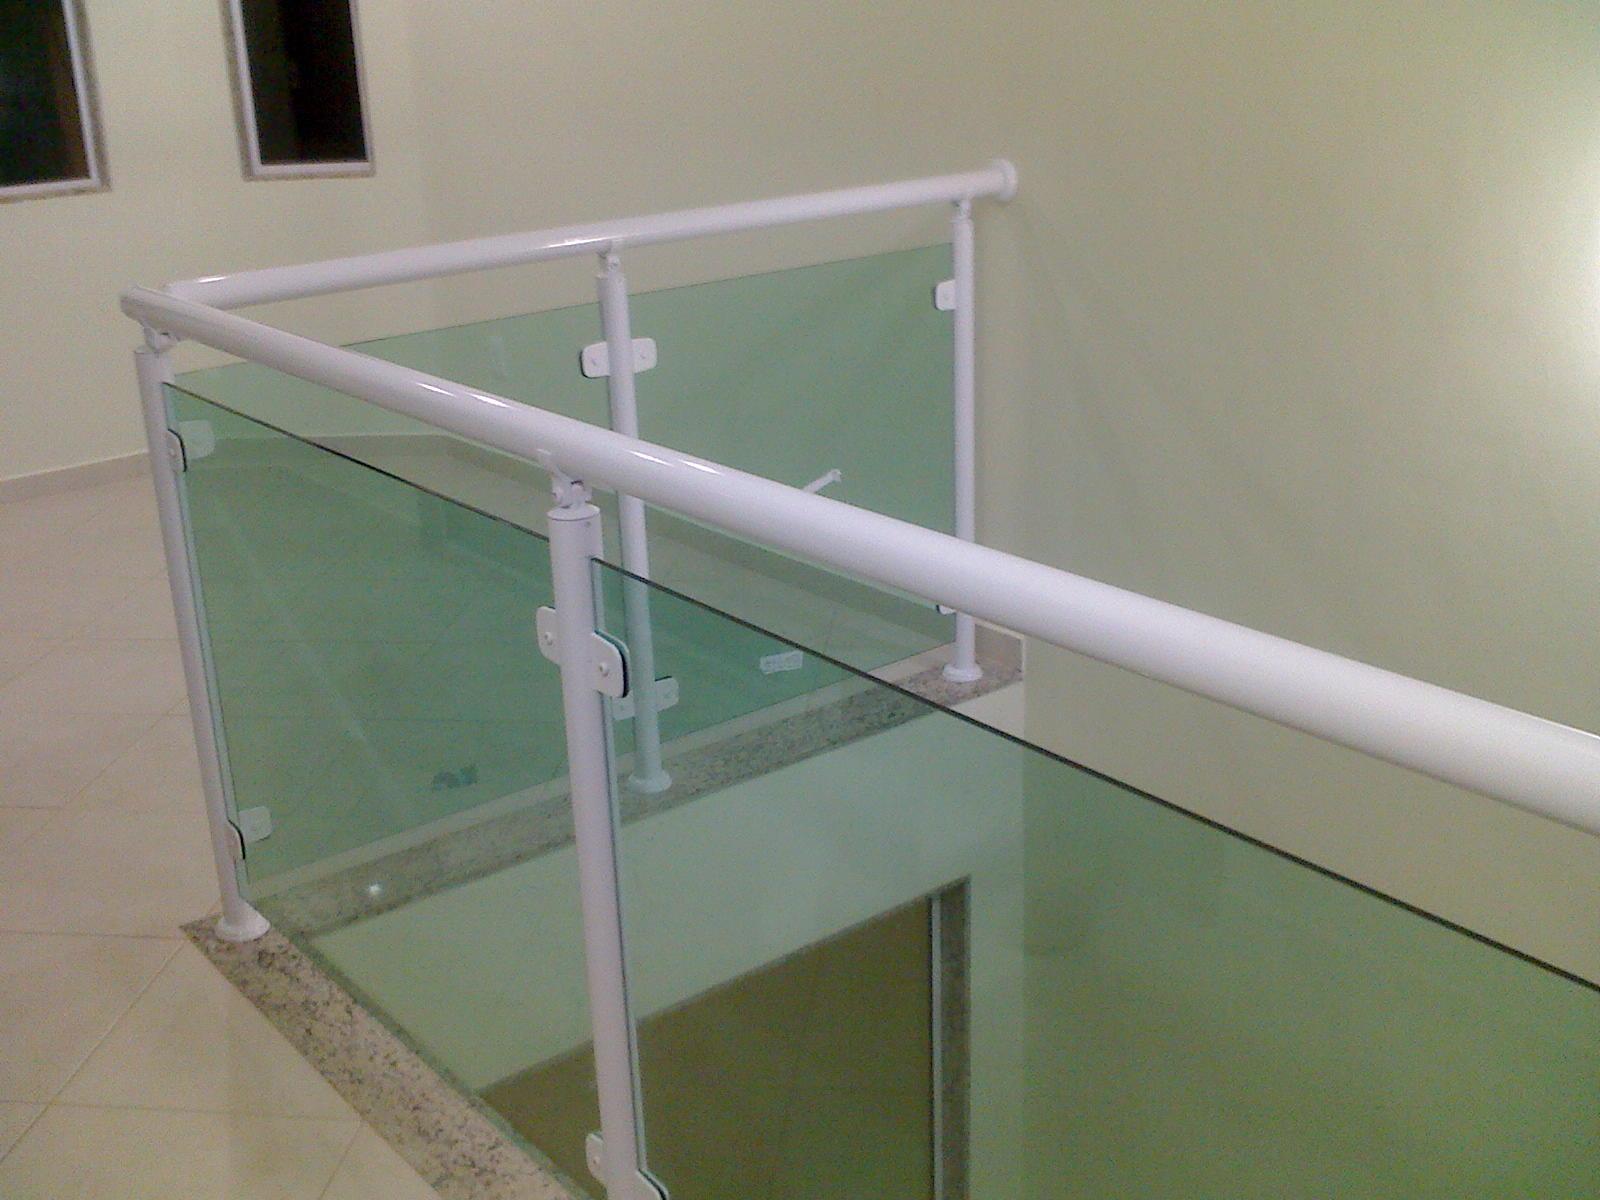 #393C25 Guarda corpo alumiglassvidracaria.com.br 1818 Janela De Aluminio Pode Ser Pintada De Branco